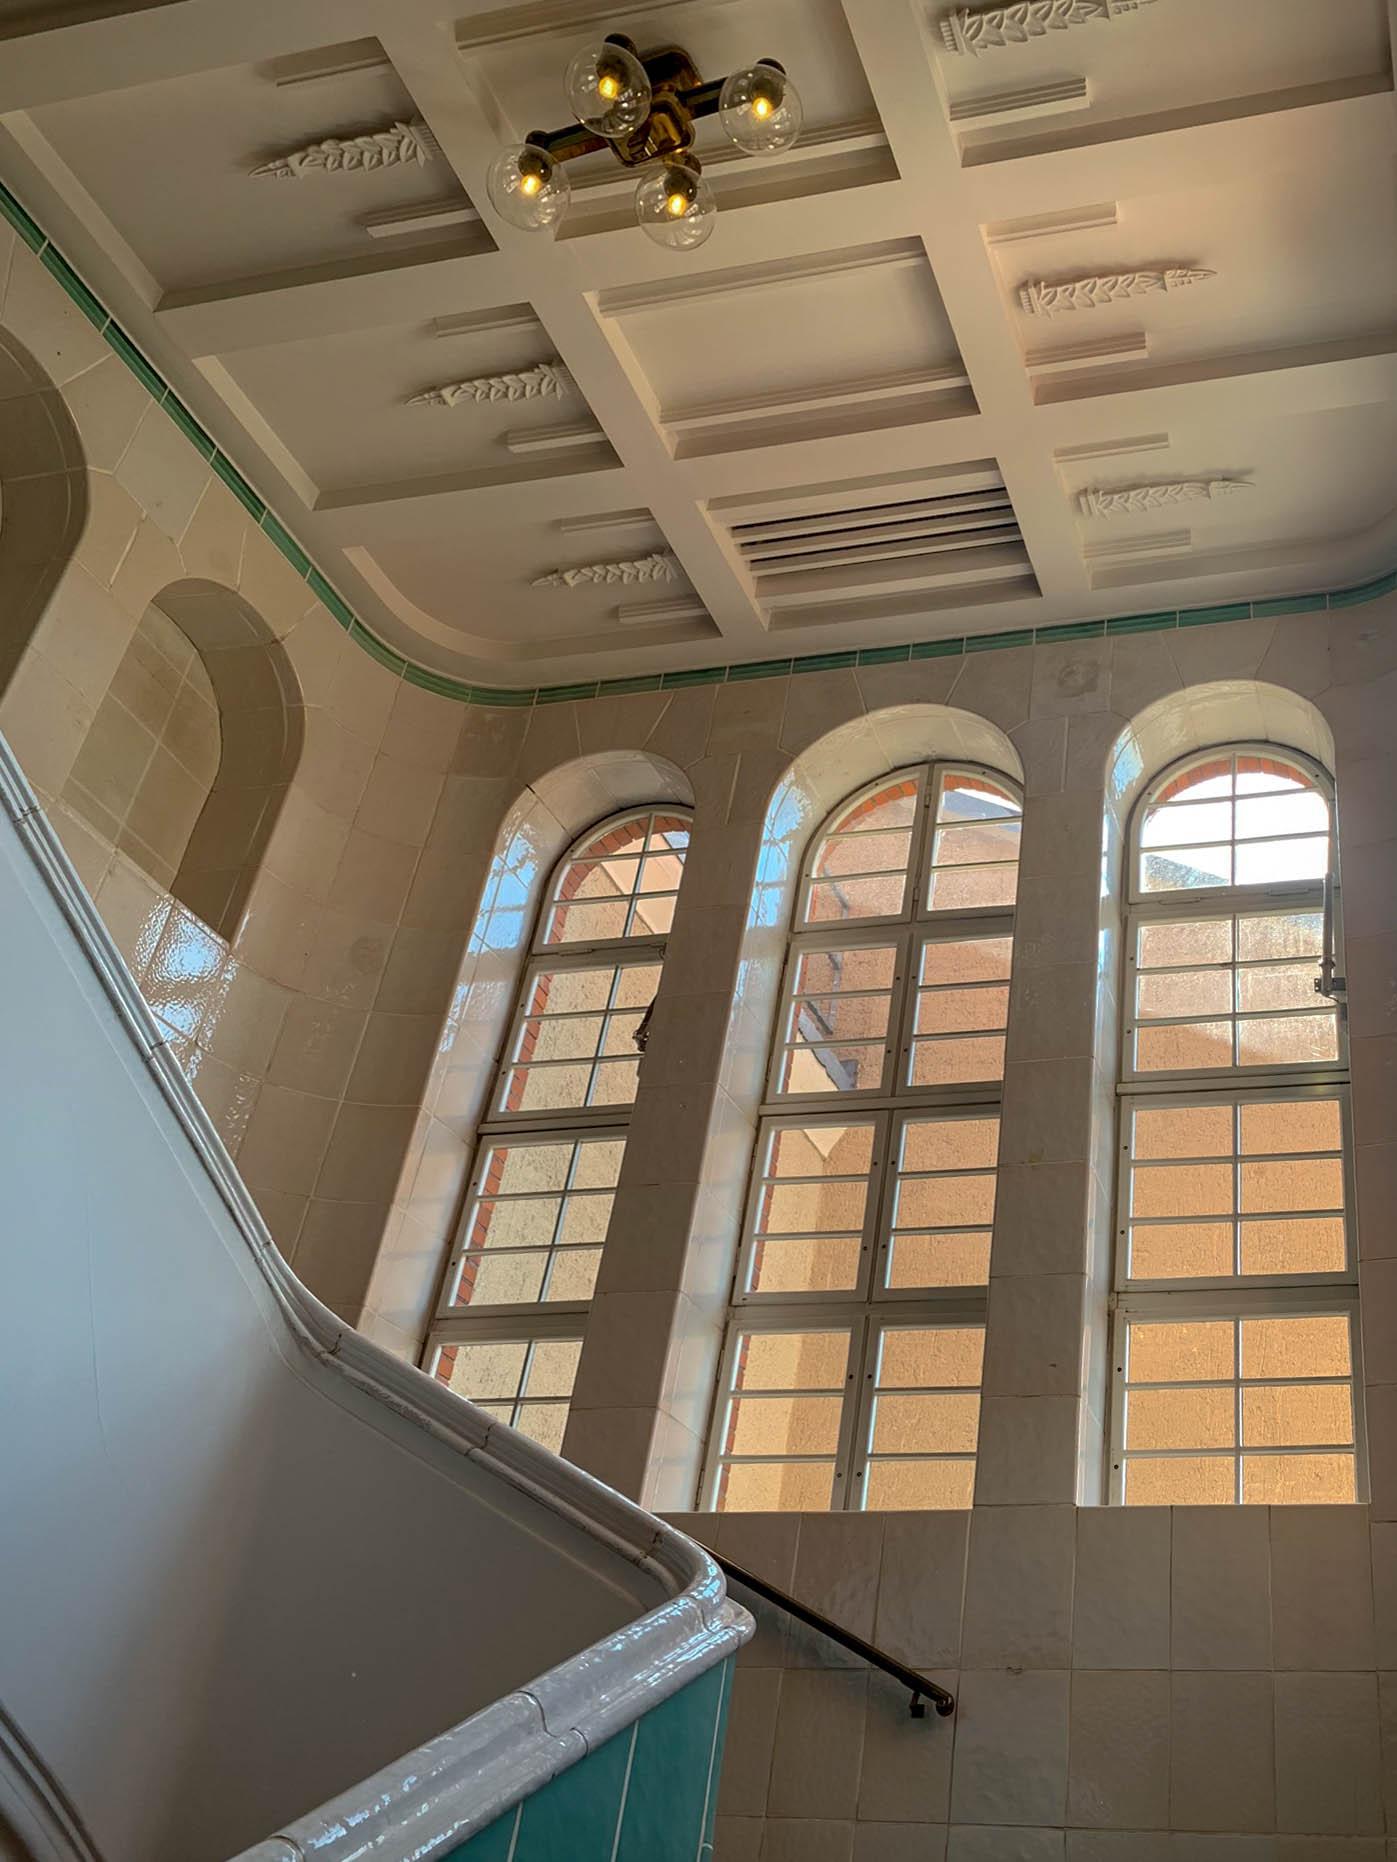 Femina-Palast, 1928-1931. Architects: Richard Bielenberg,